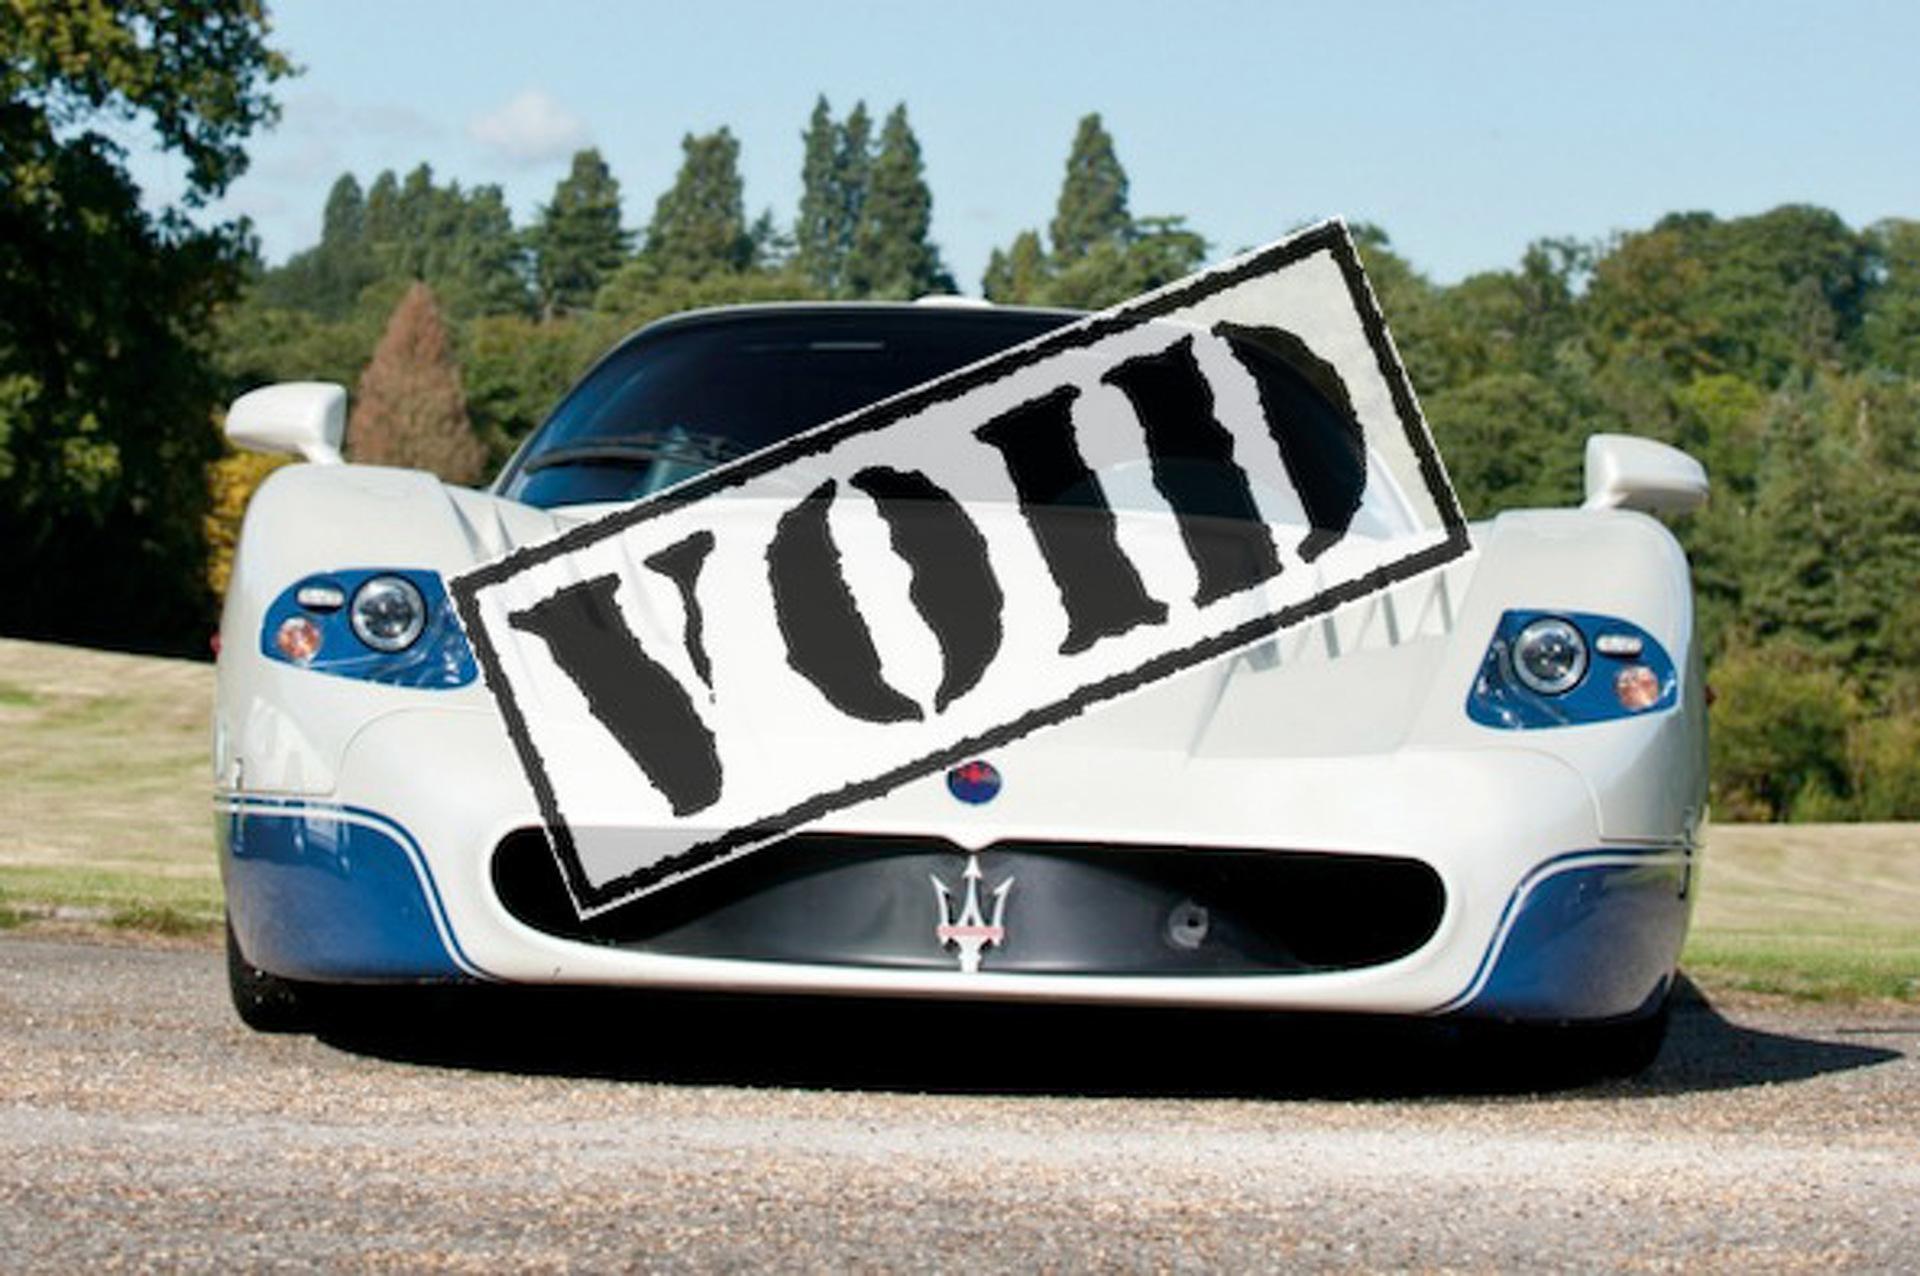 Maserati Ditches Supercar, Plans Smaller Sportscar